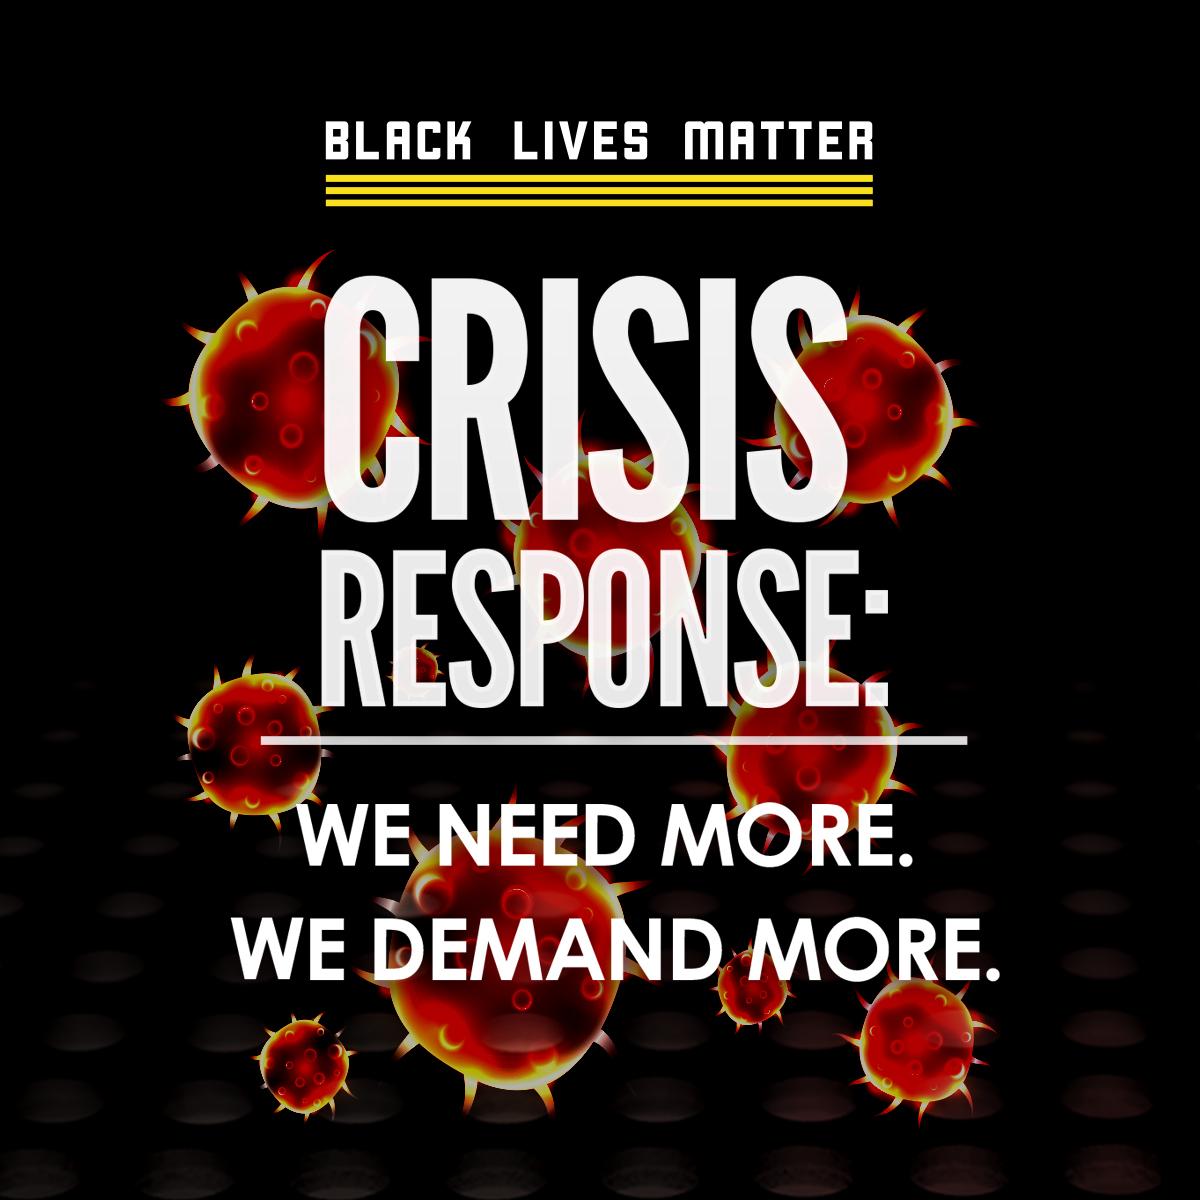 Crisis Response: We need more. We demand more. image